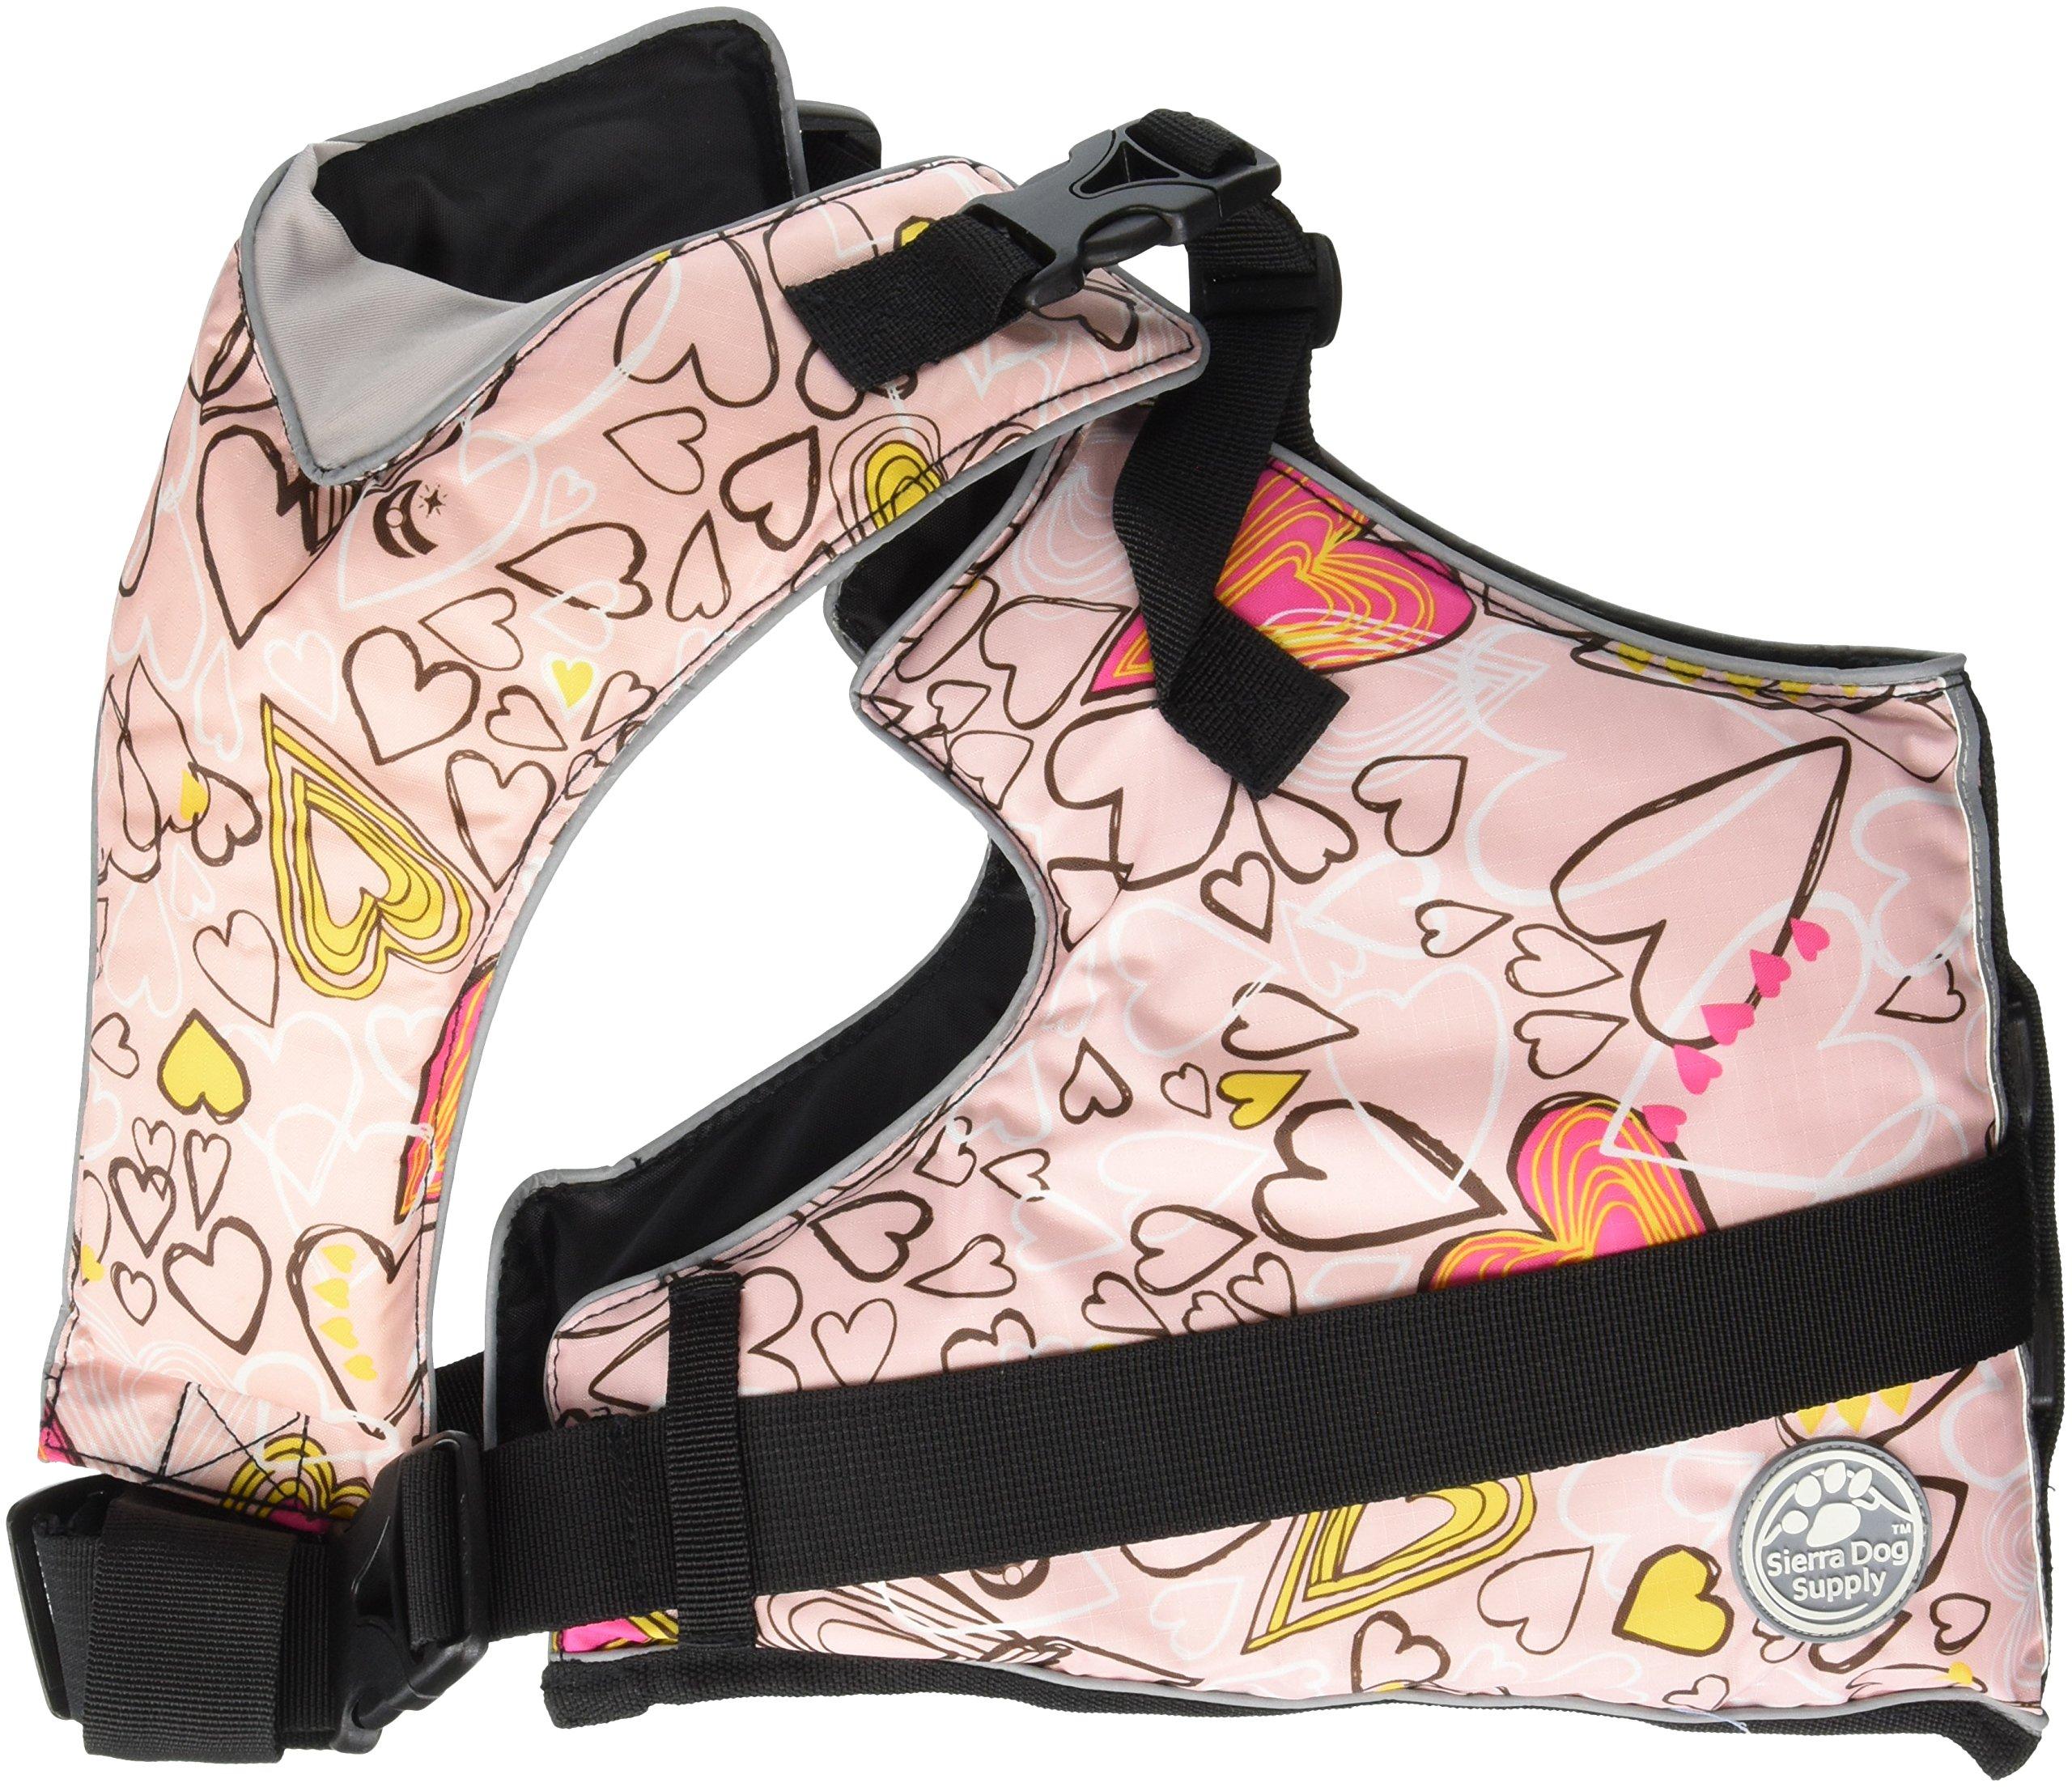 Doggles Medium Swim Vest with Hearts, Pink